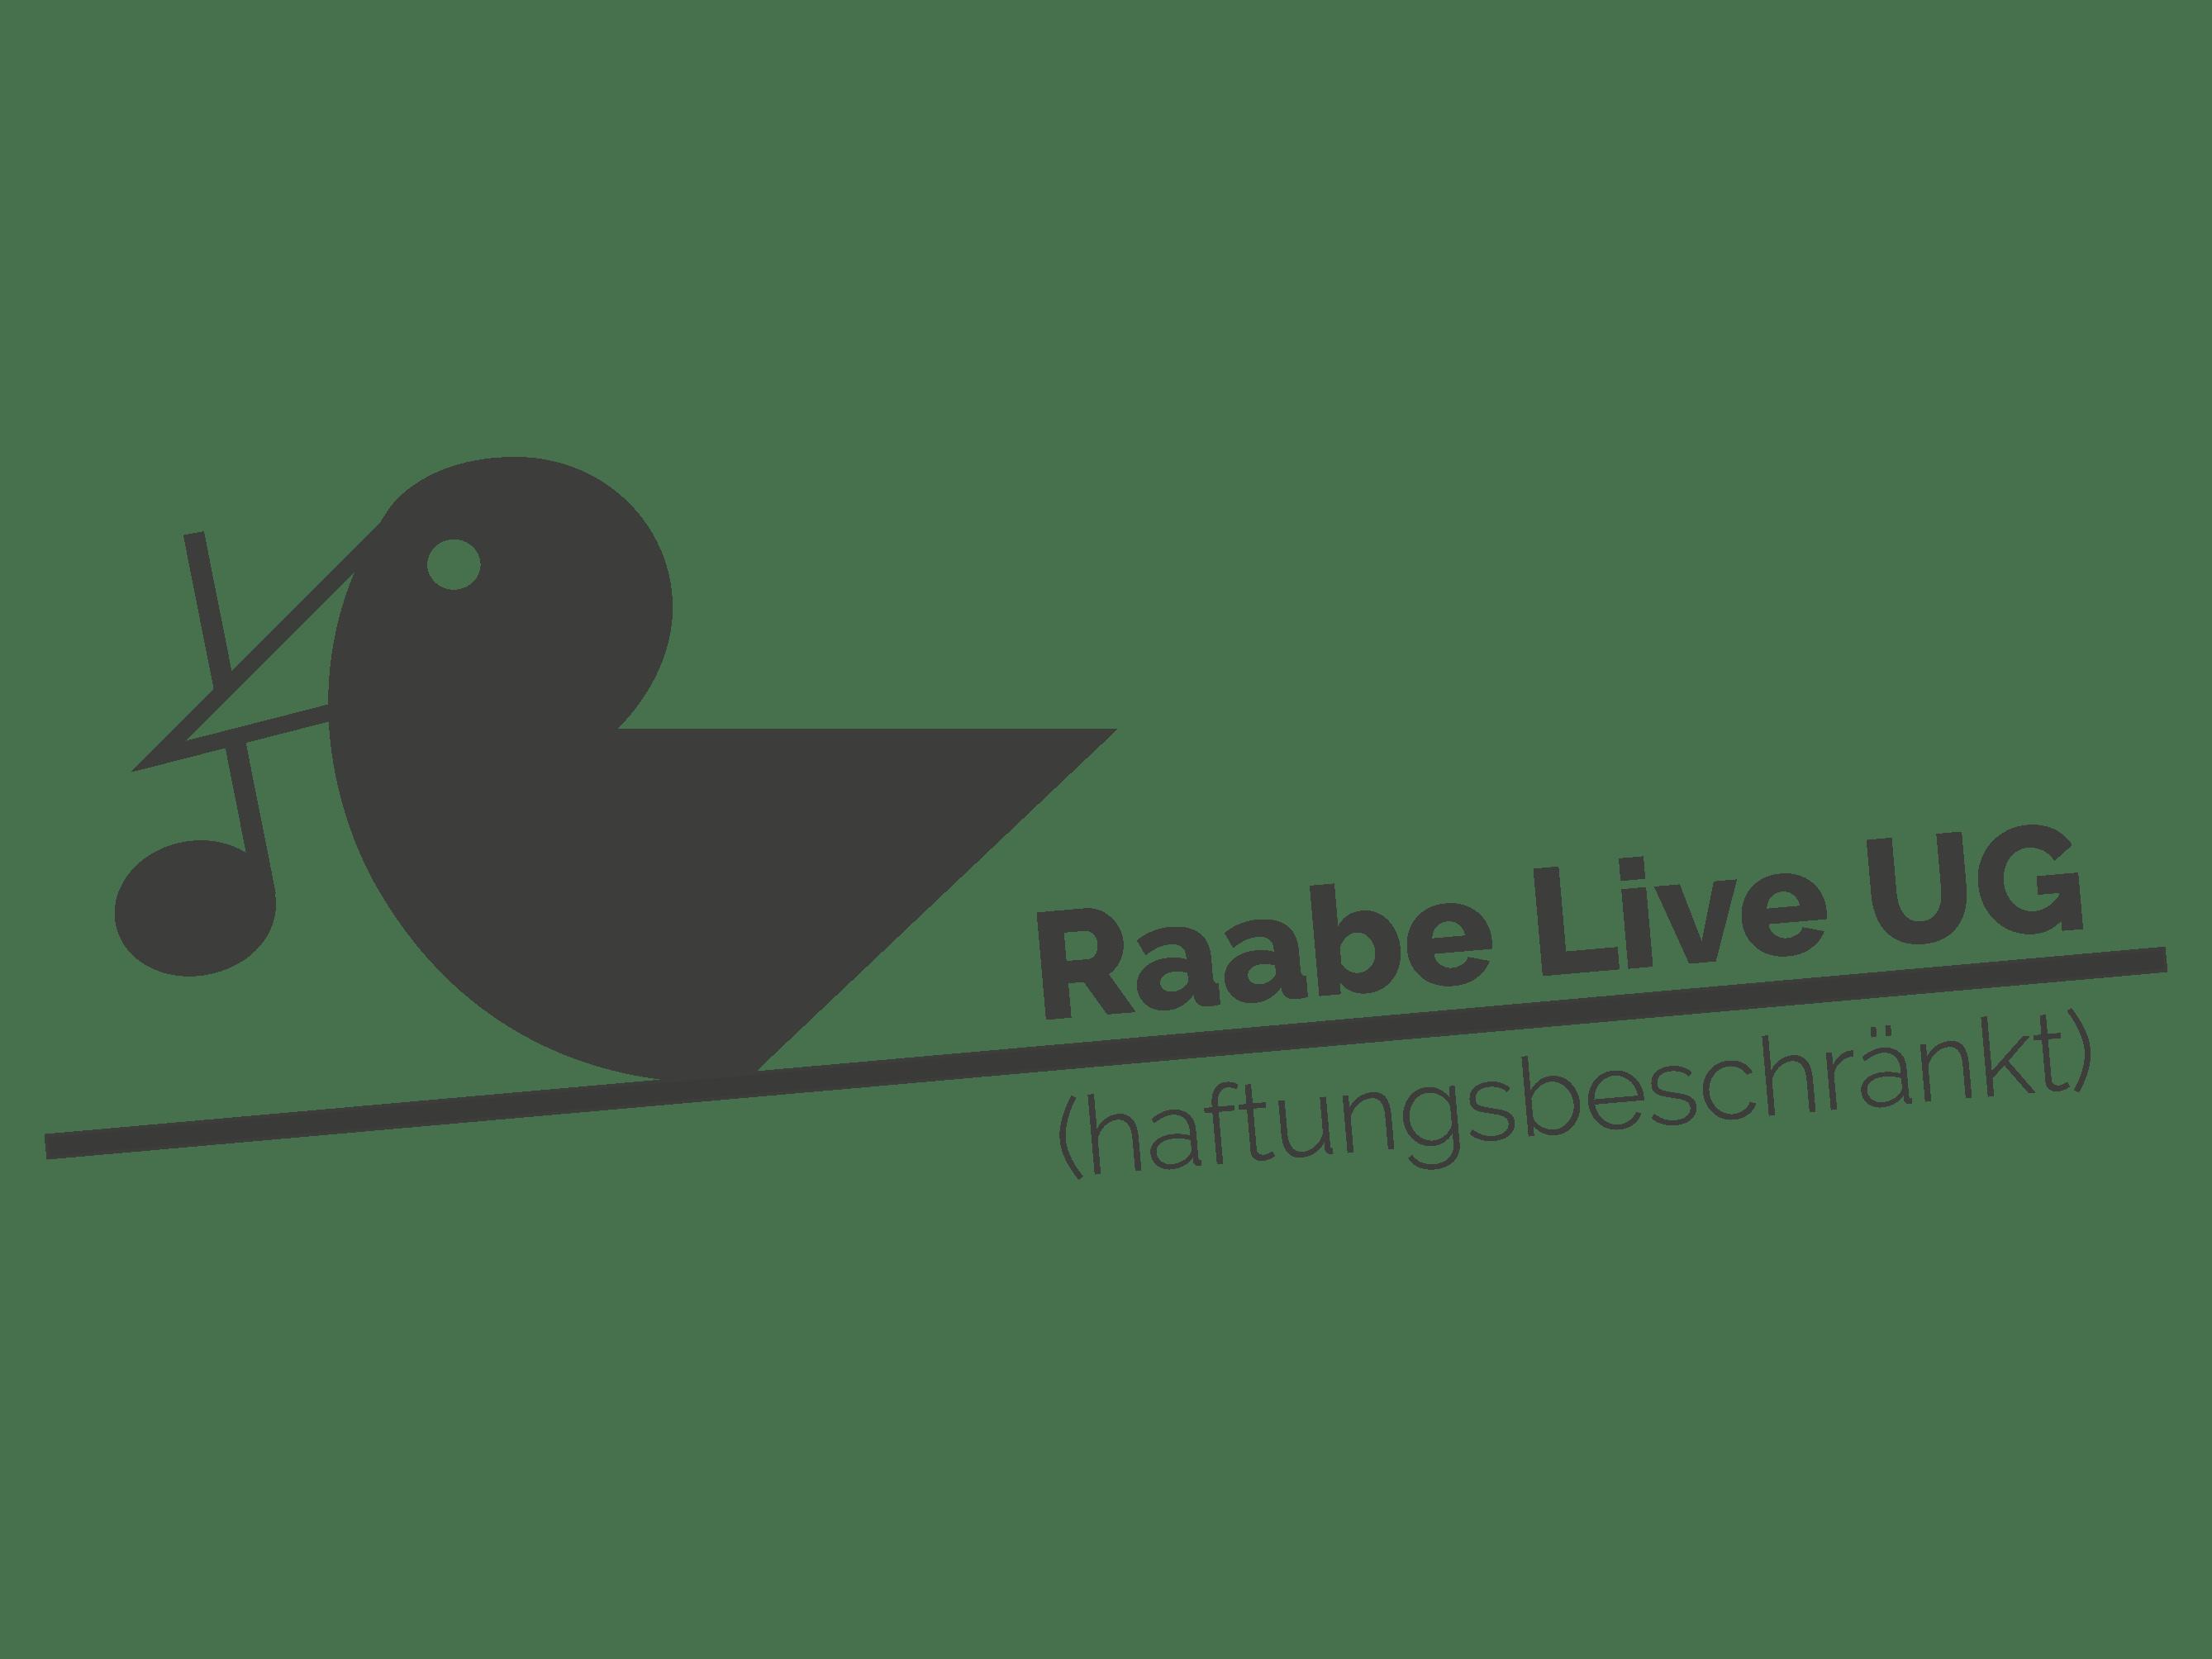 Raabe Live